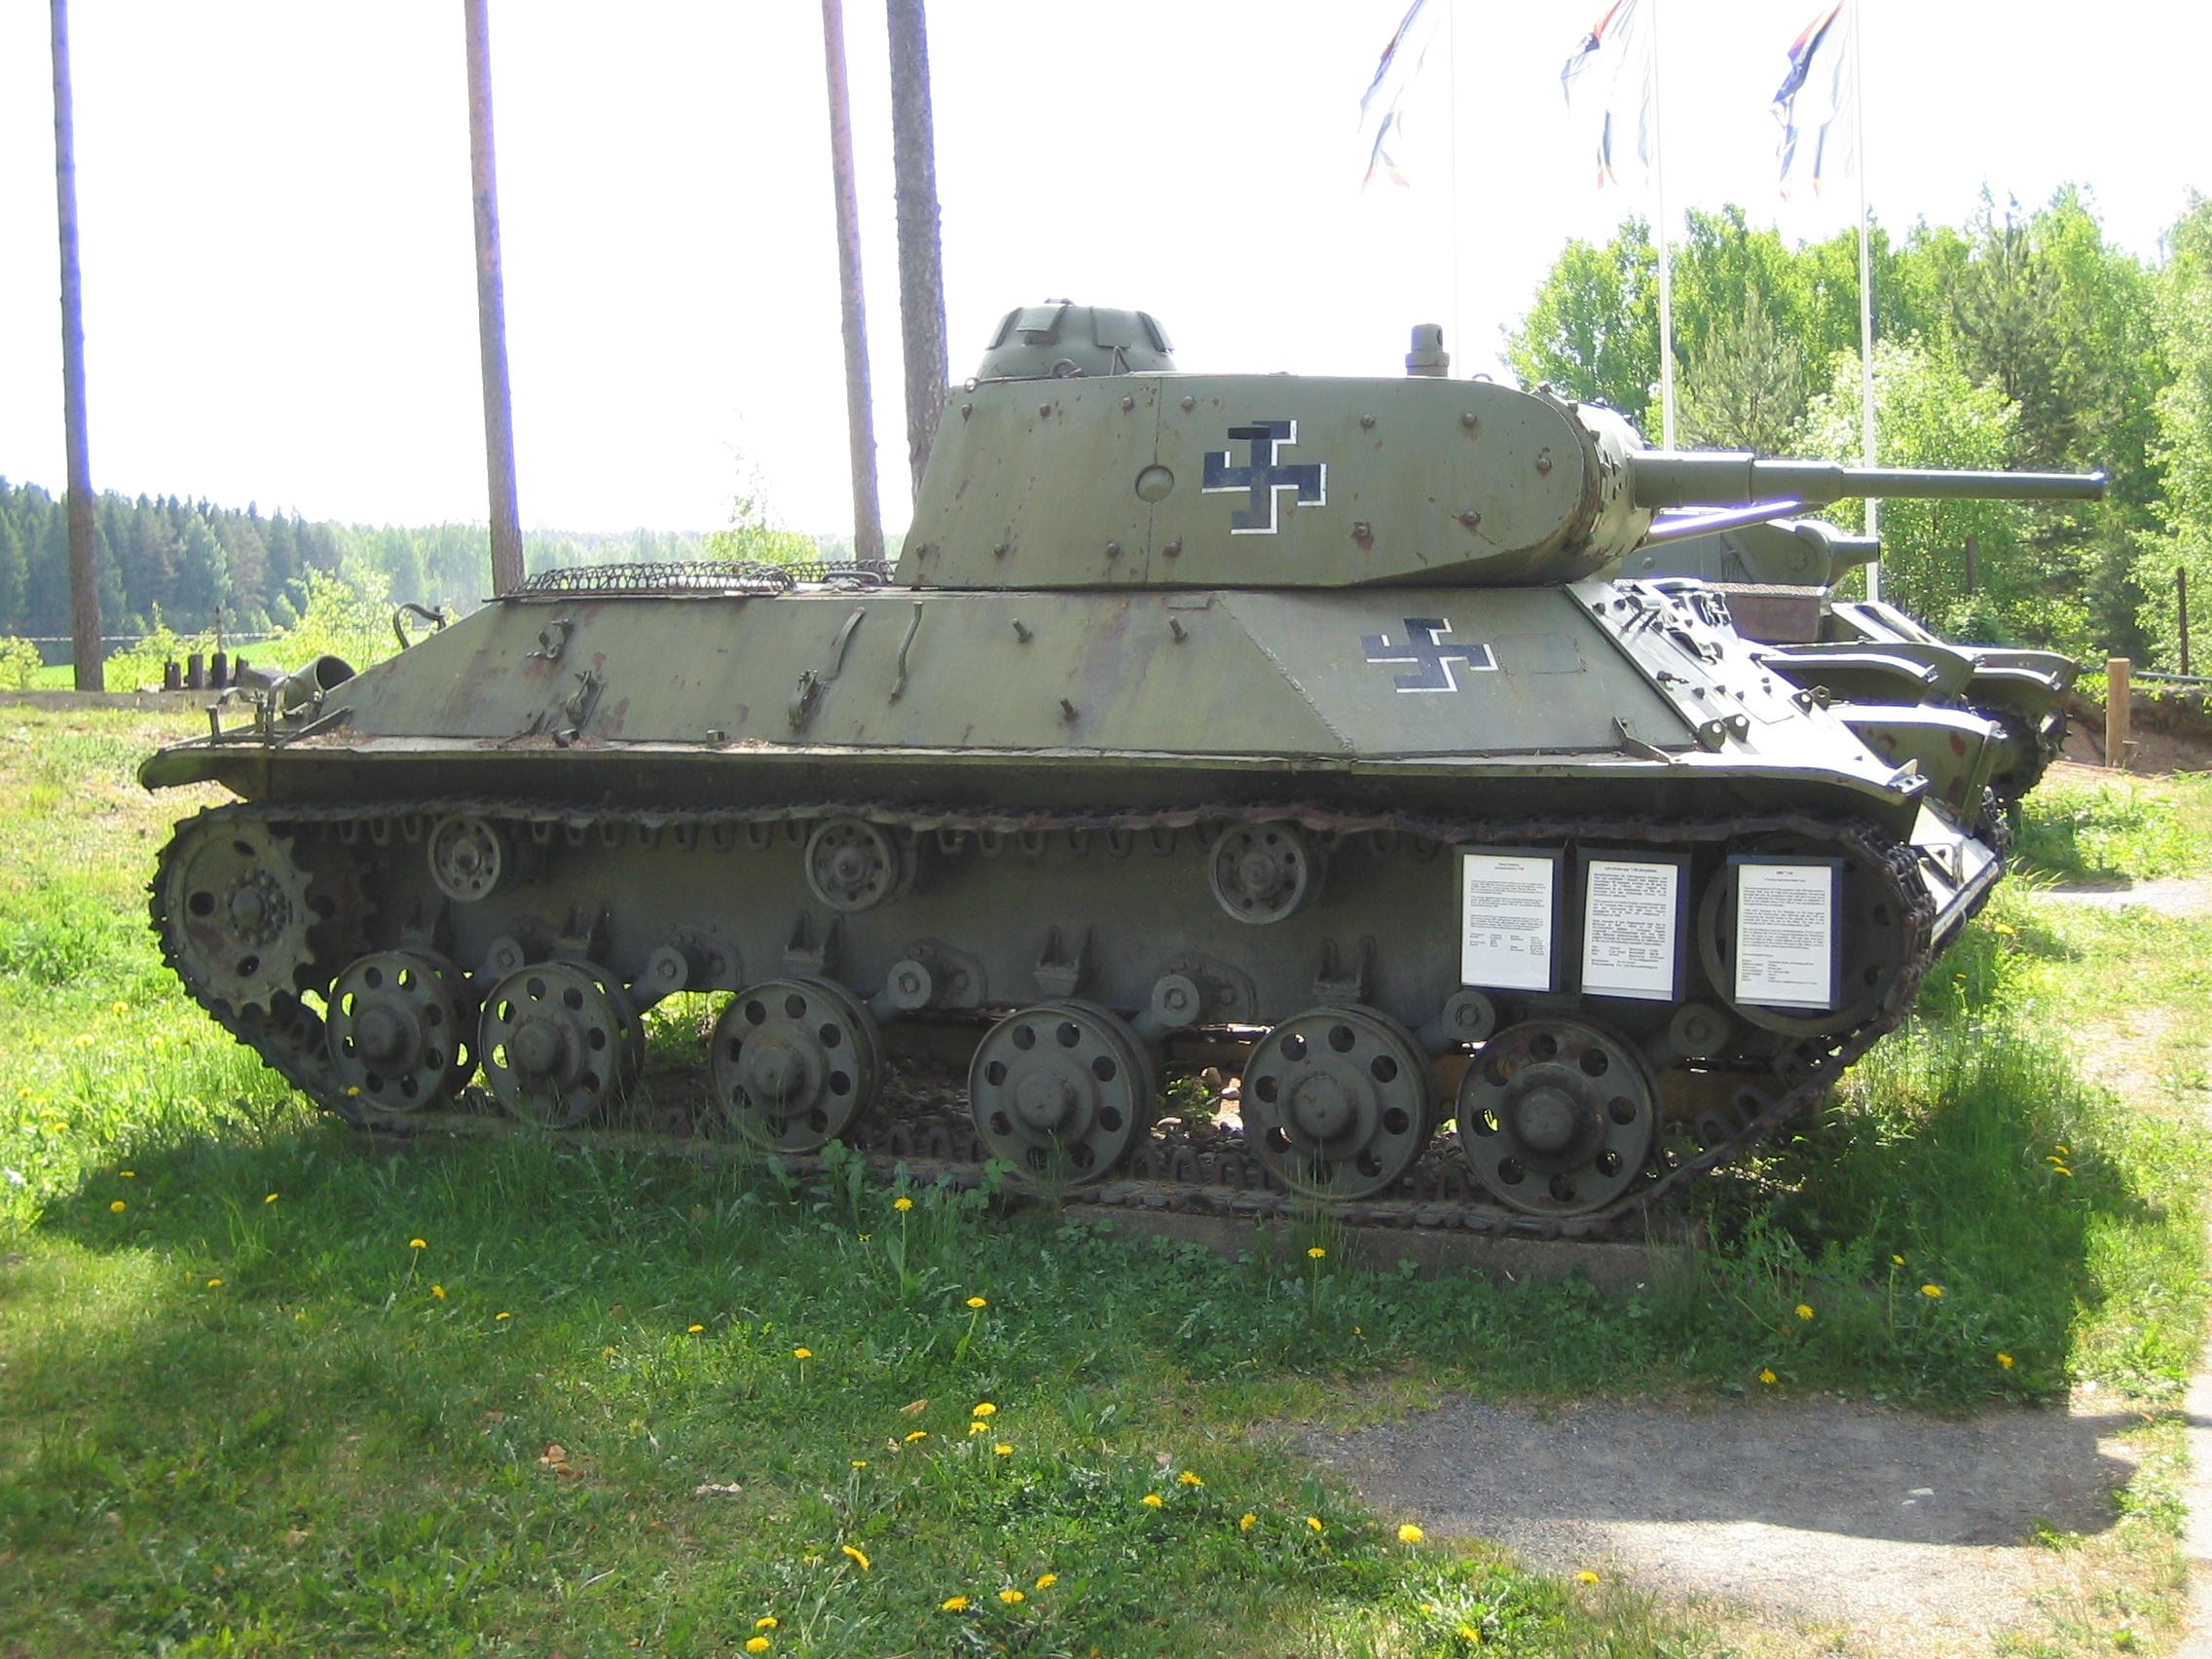 File:T-50 Parola tank museum.jpg - Wikimedia Commons